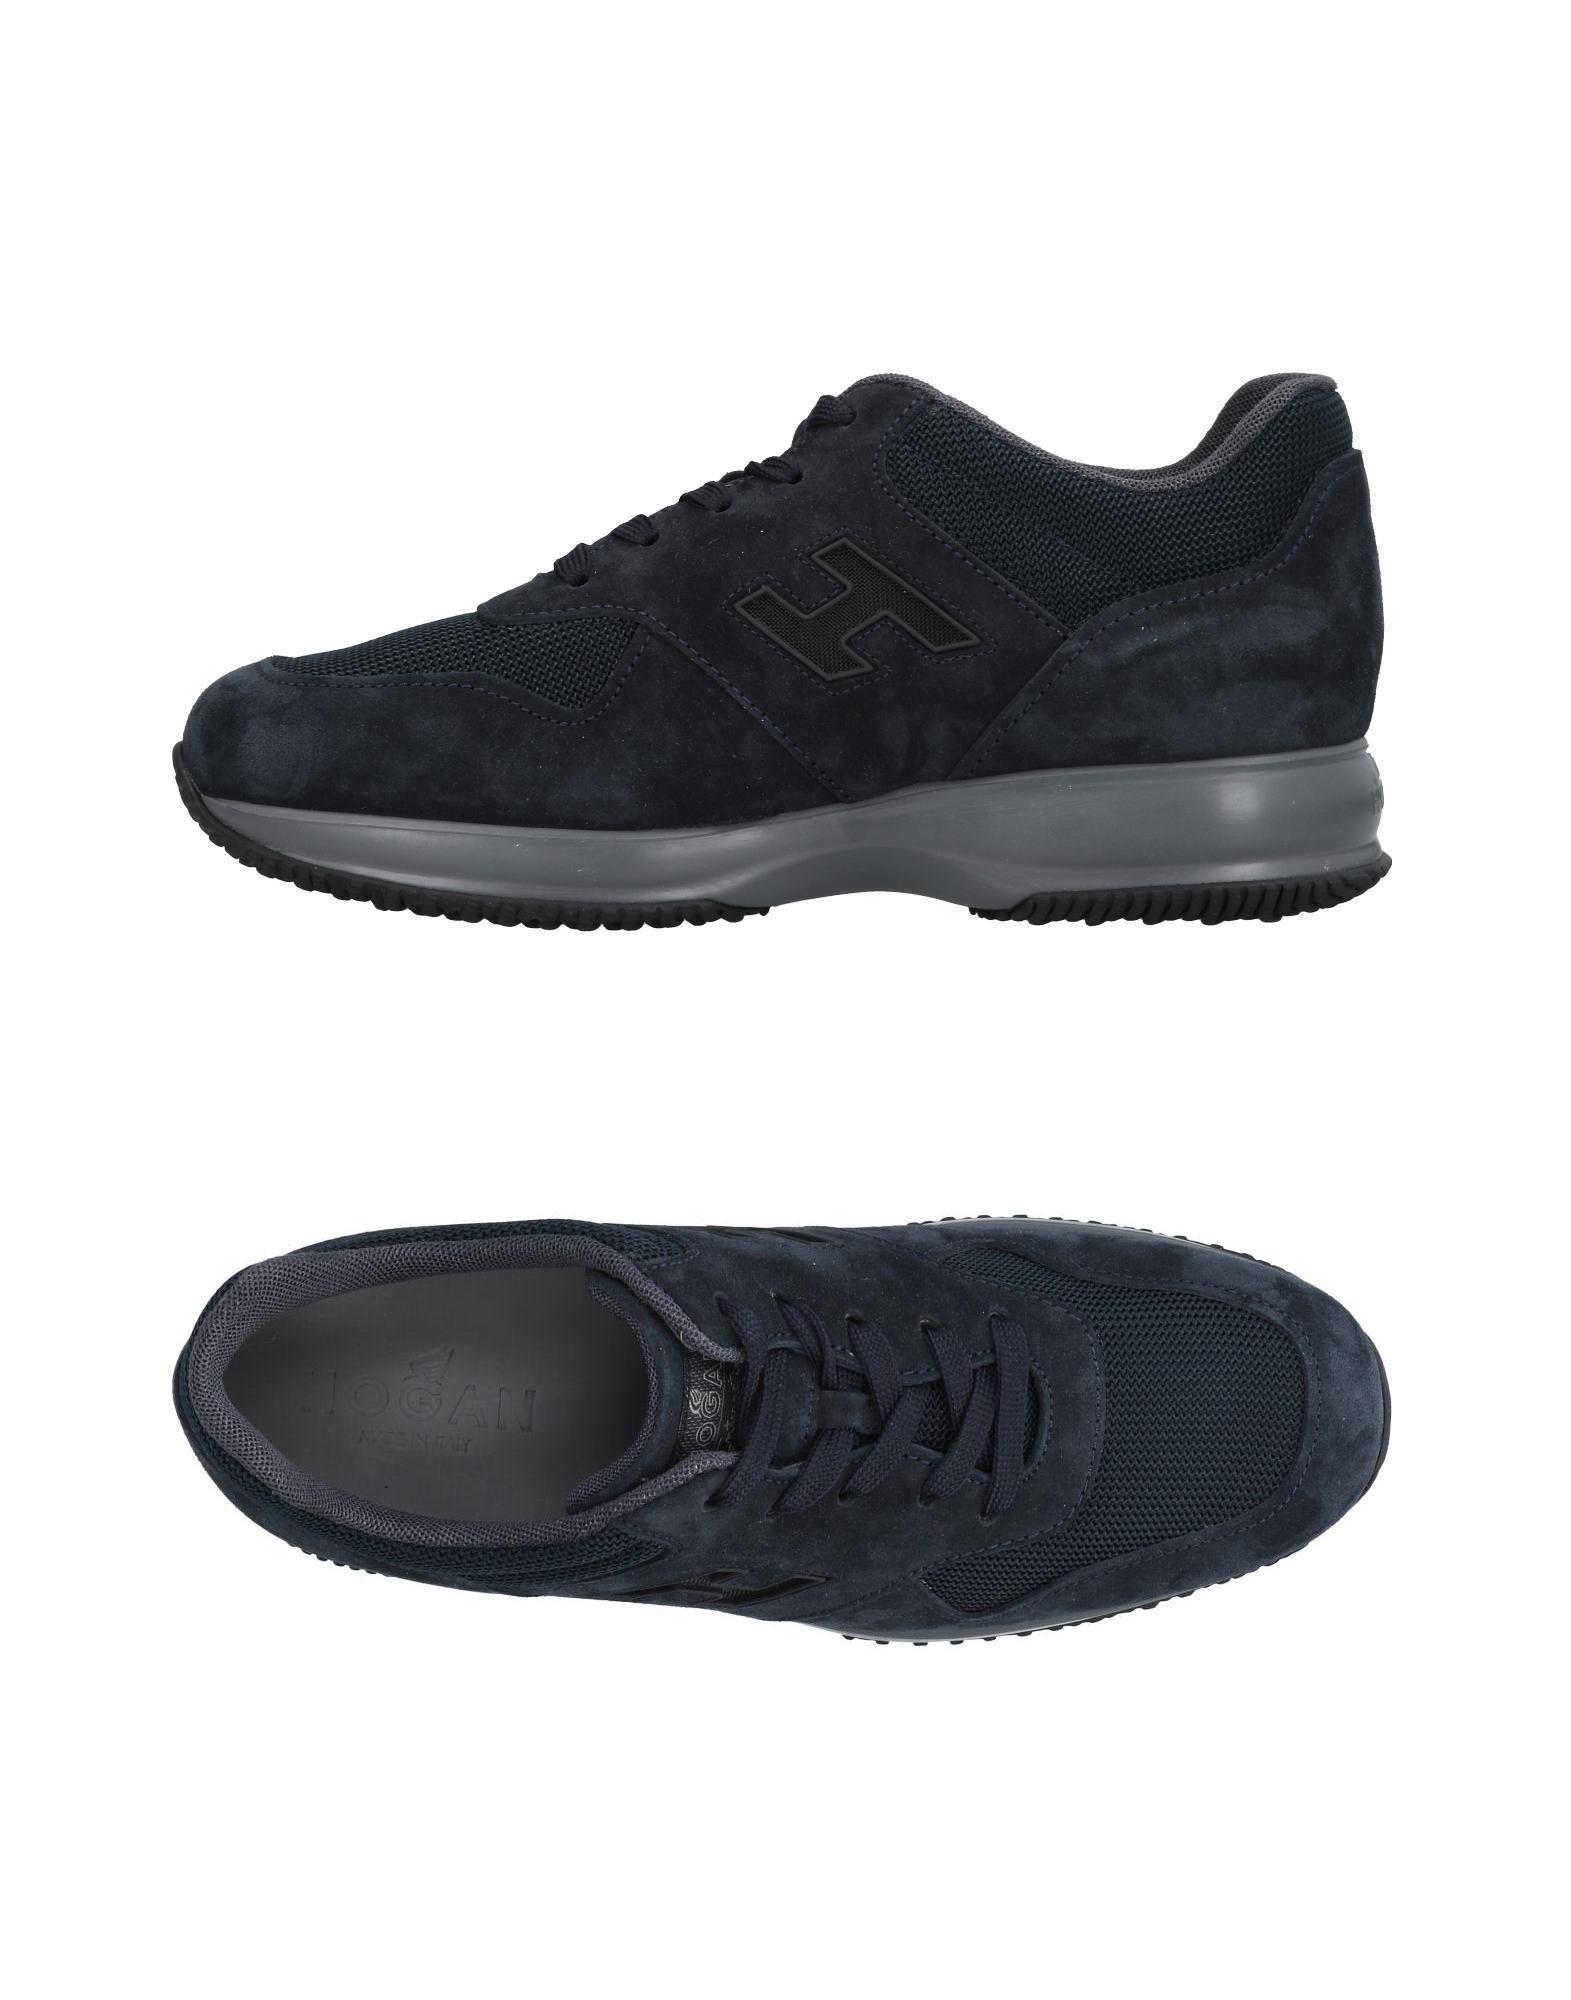 Hogan Sneakers Herren  11462061DR Gute Qualität beliebte Schuhe